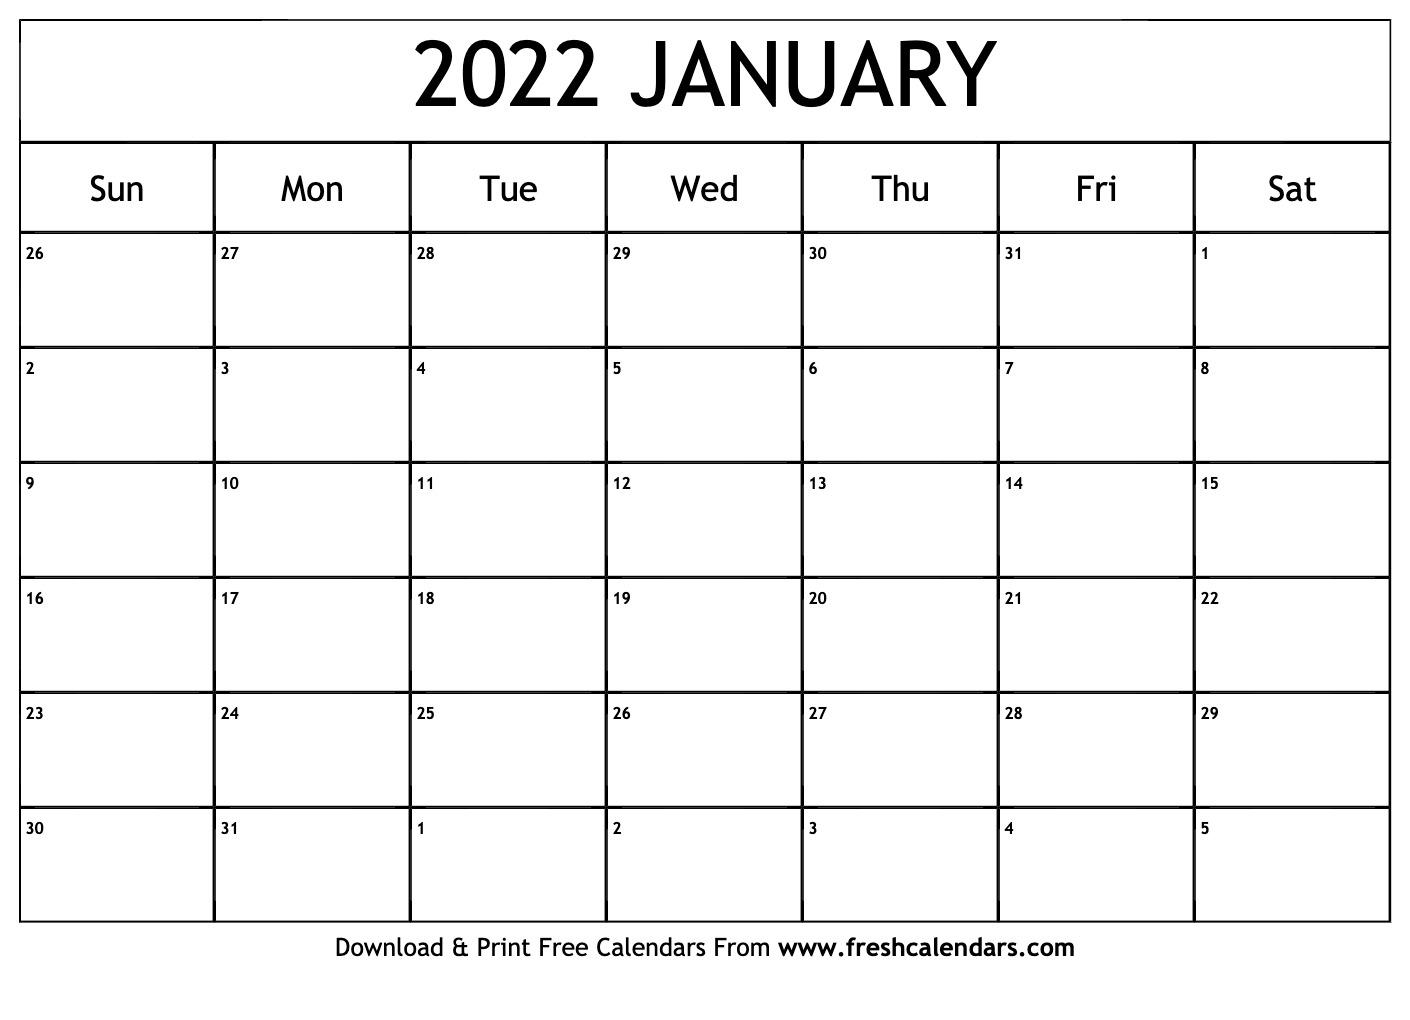 Blank Printable January 2022 Calendars Regarding Empty January 2022 Calendar